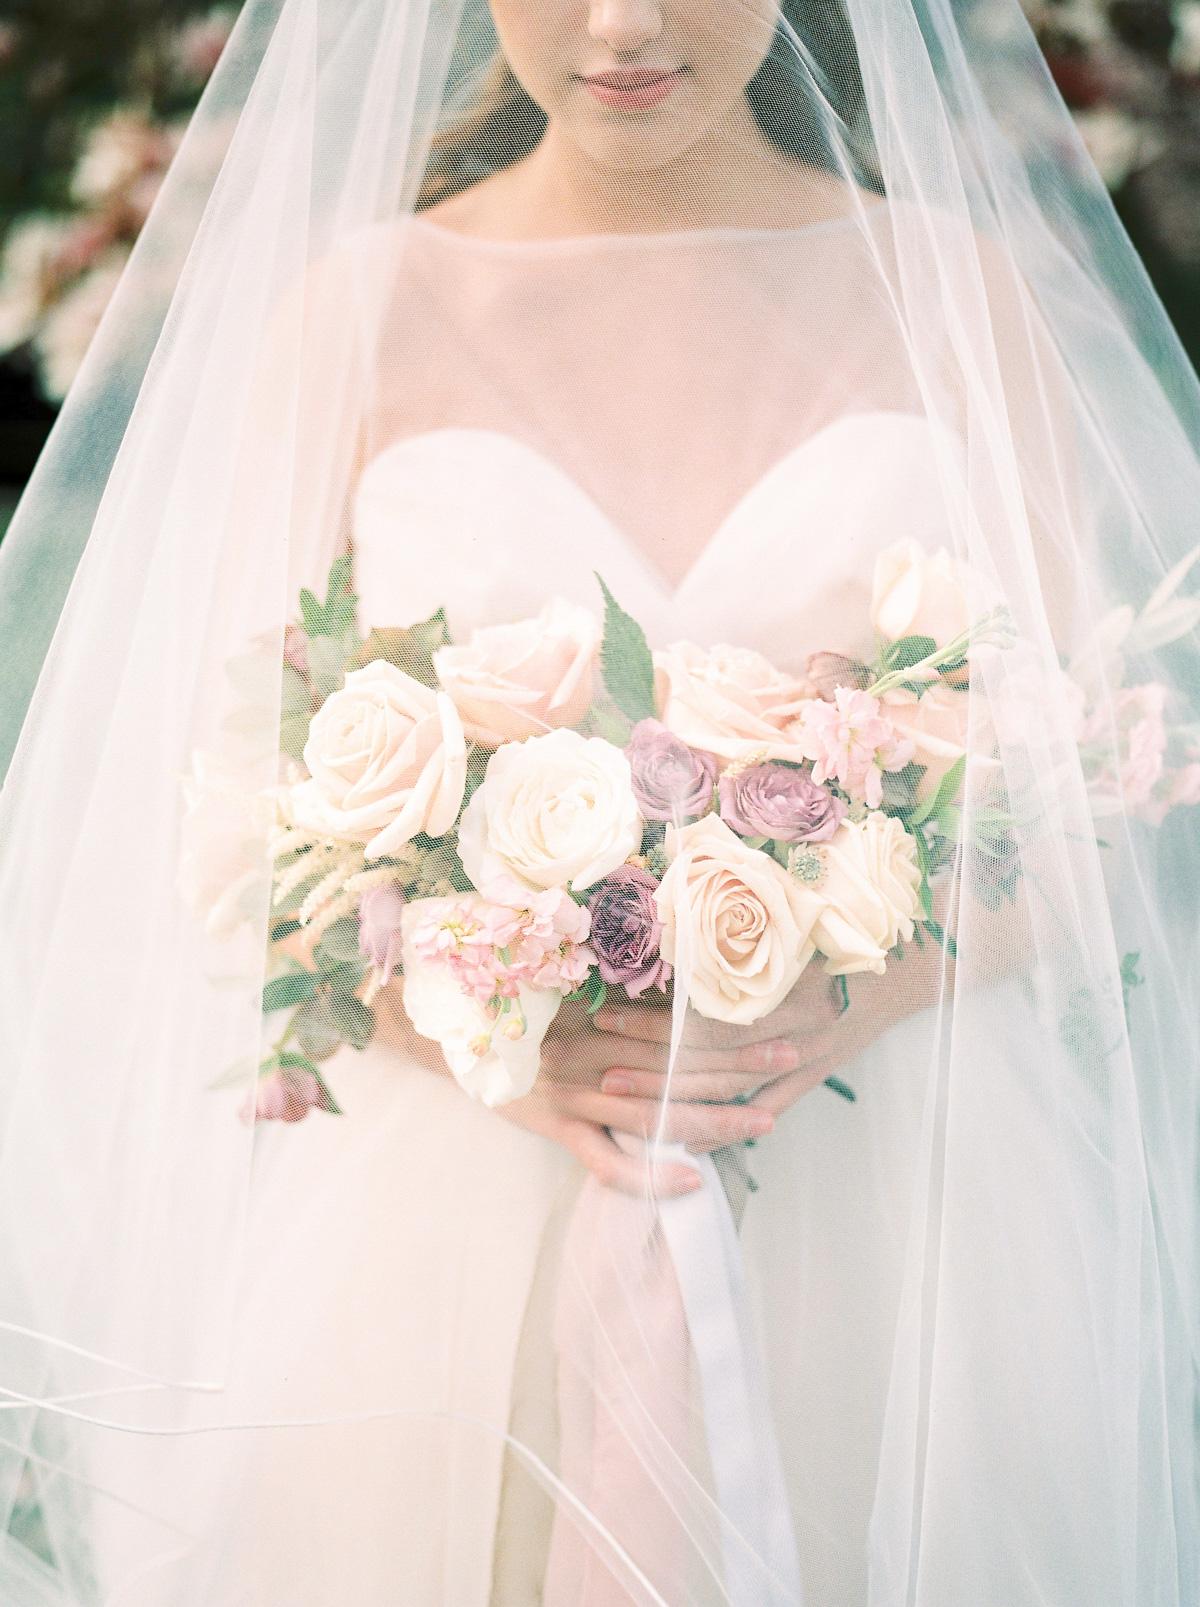 julia-park-photography-vineyard-bride-swish-list-niagara-on-the-lake-wedding-editorial-35.jpg